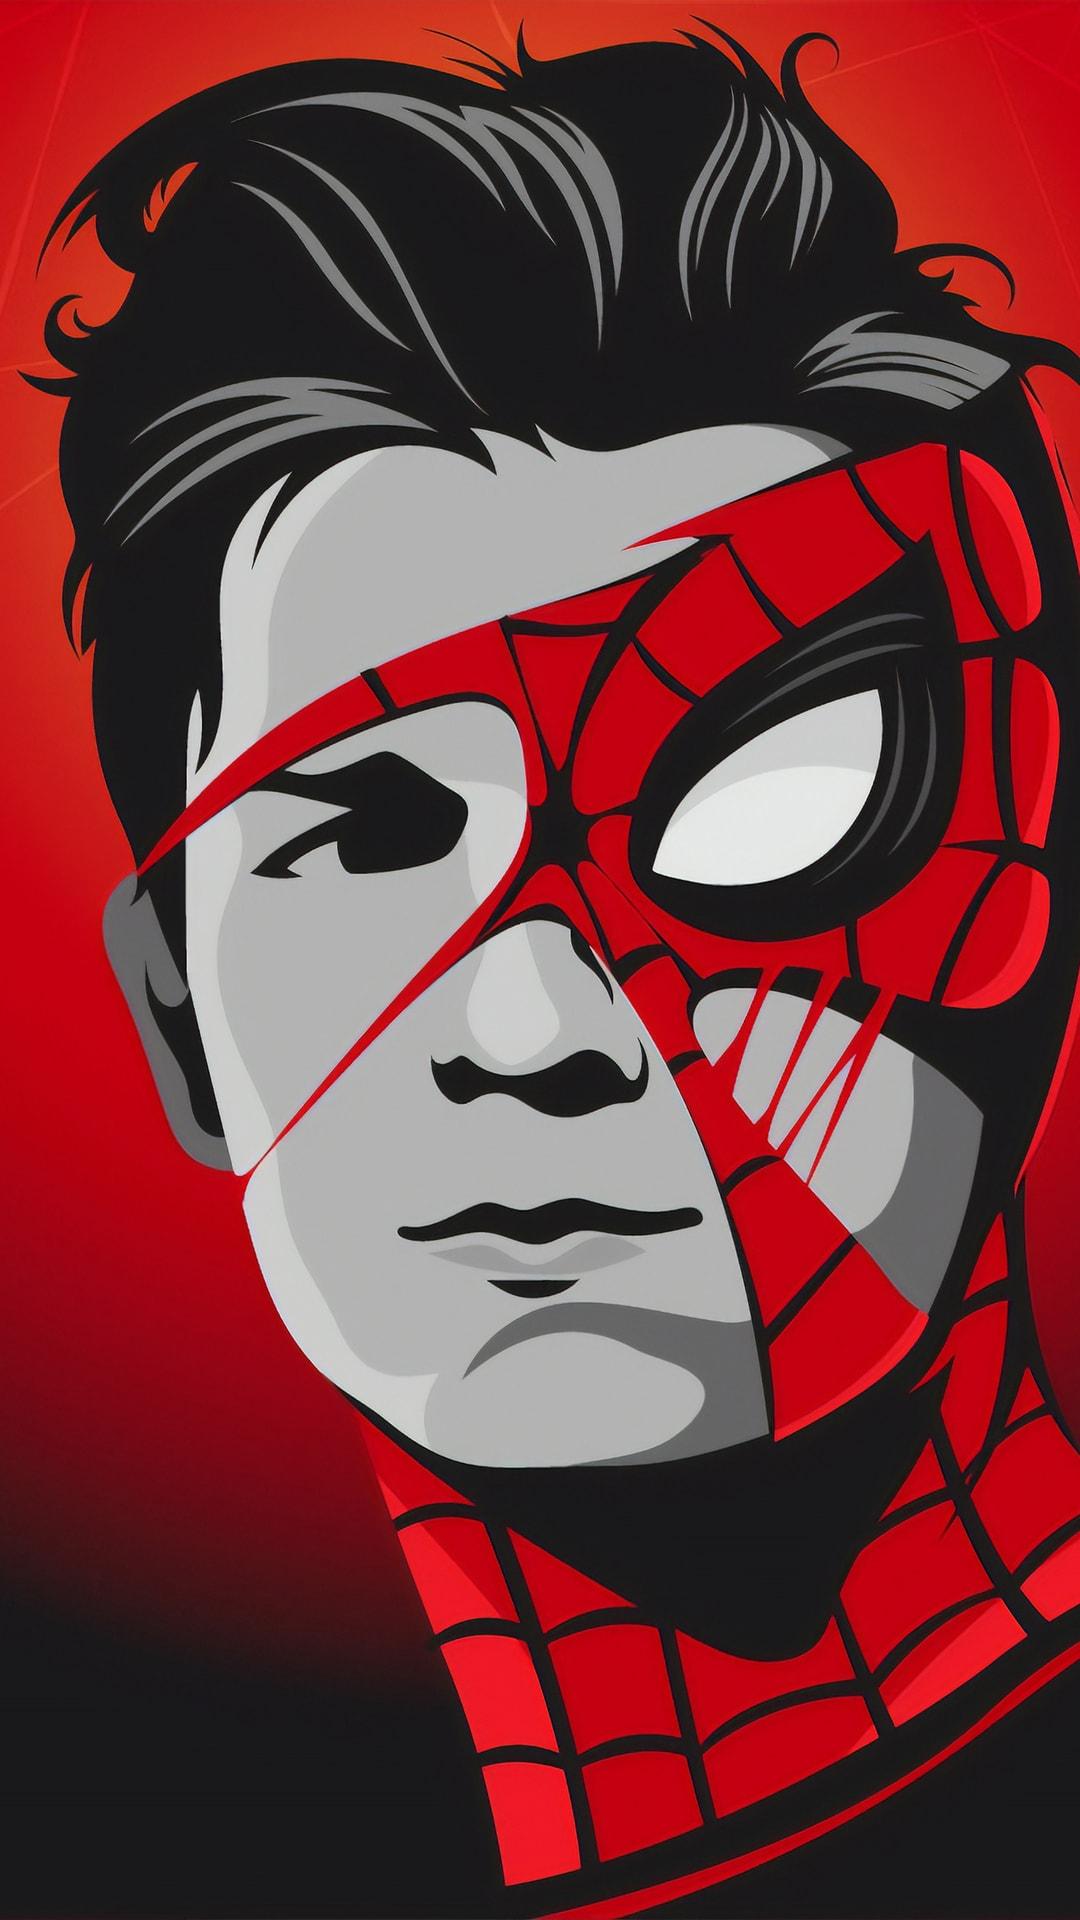 Tom Holland Spiderman Mask